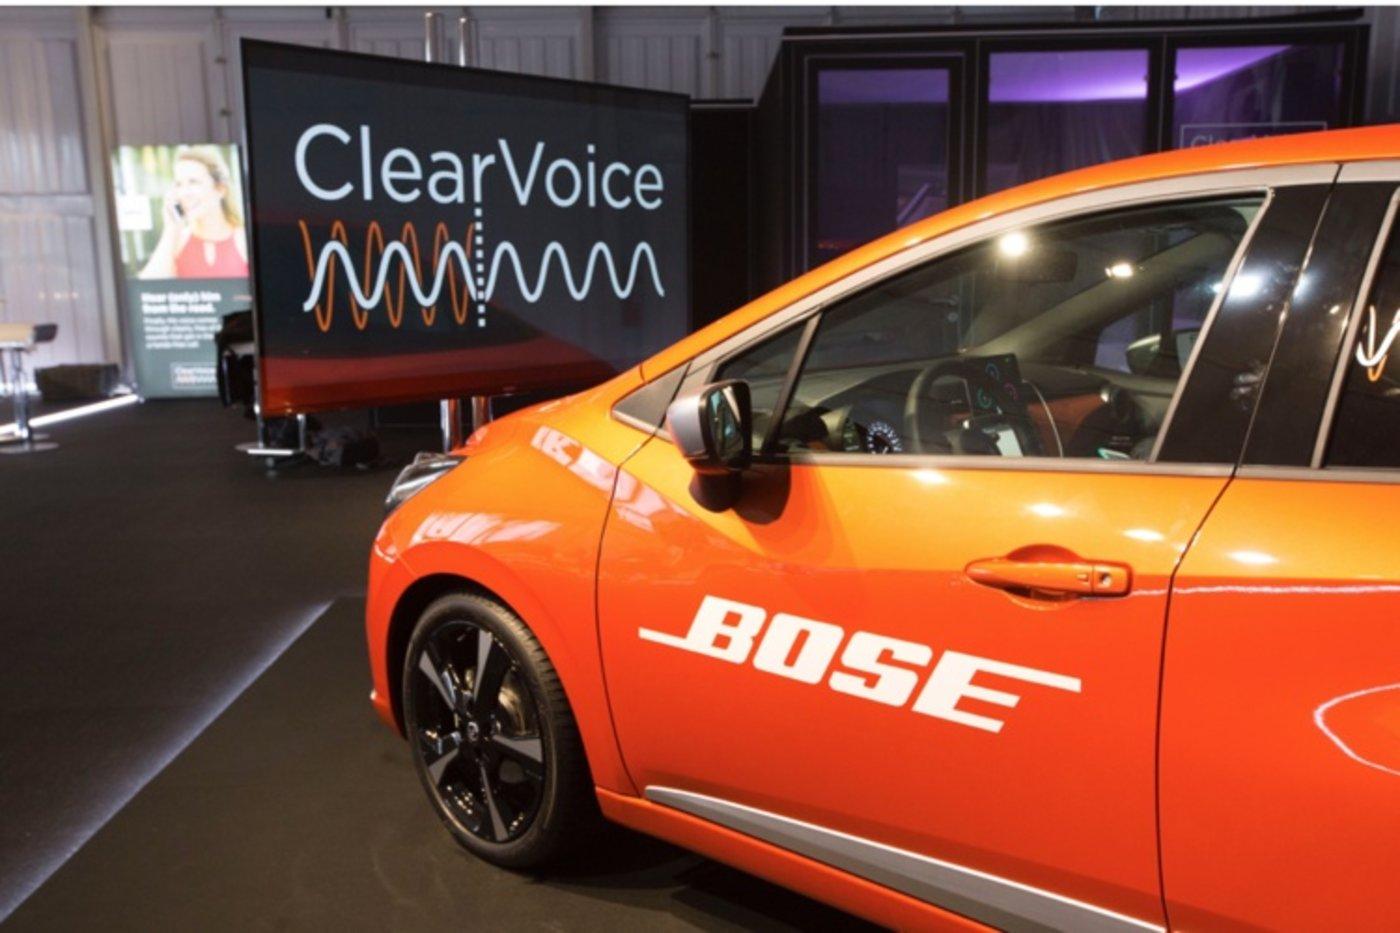 Bose ClearVoice车载语音识别技术